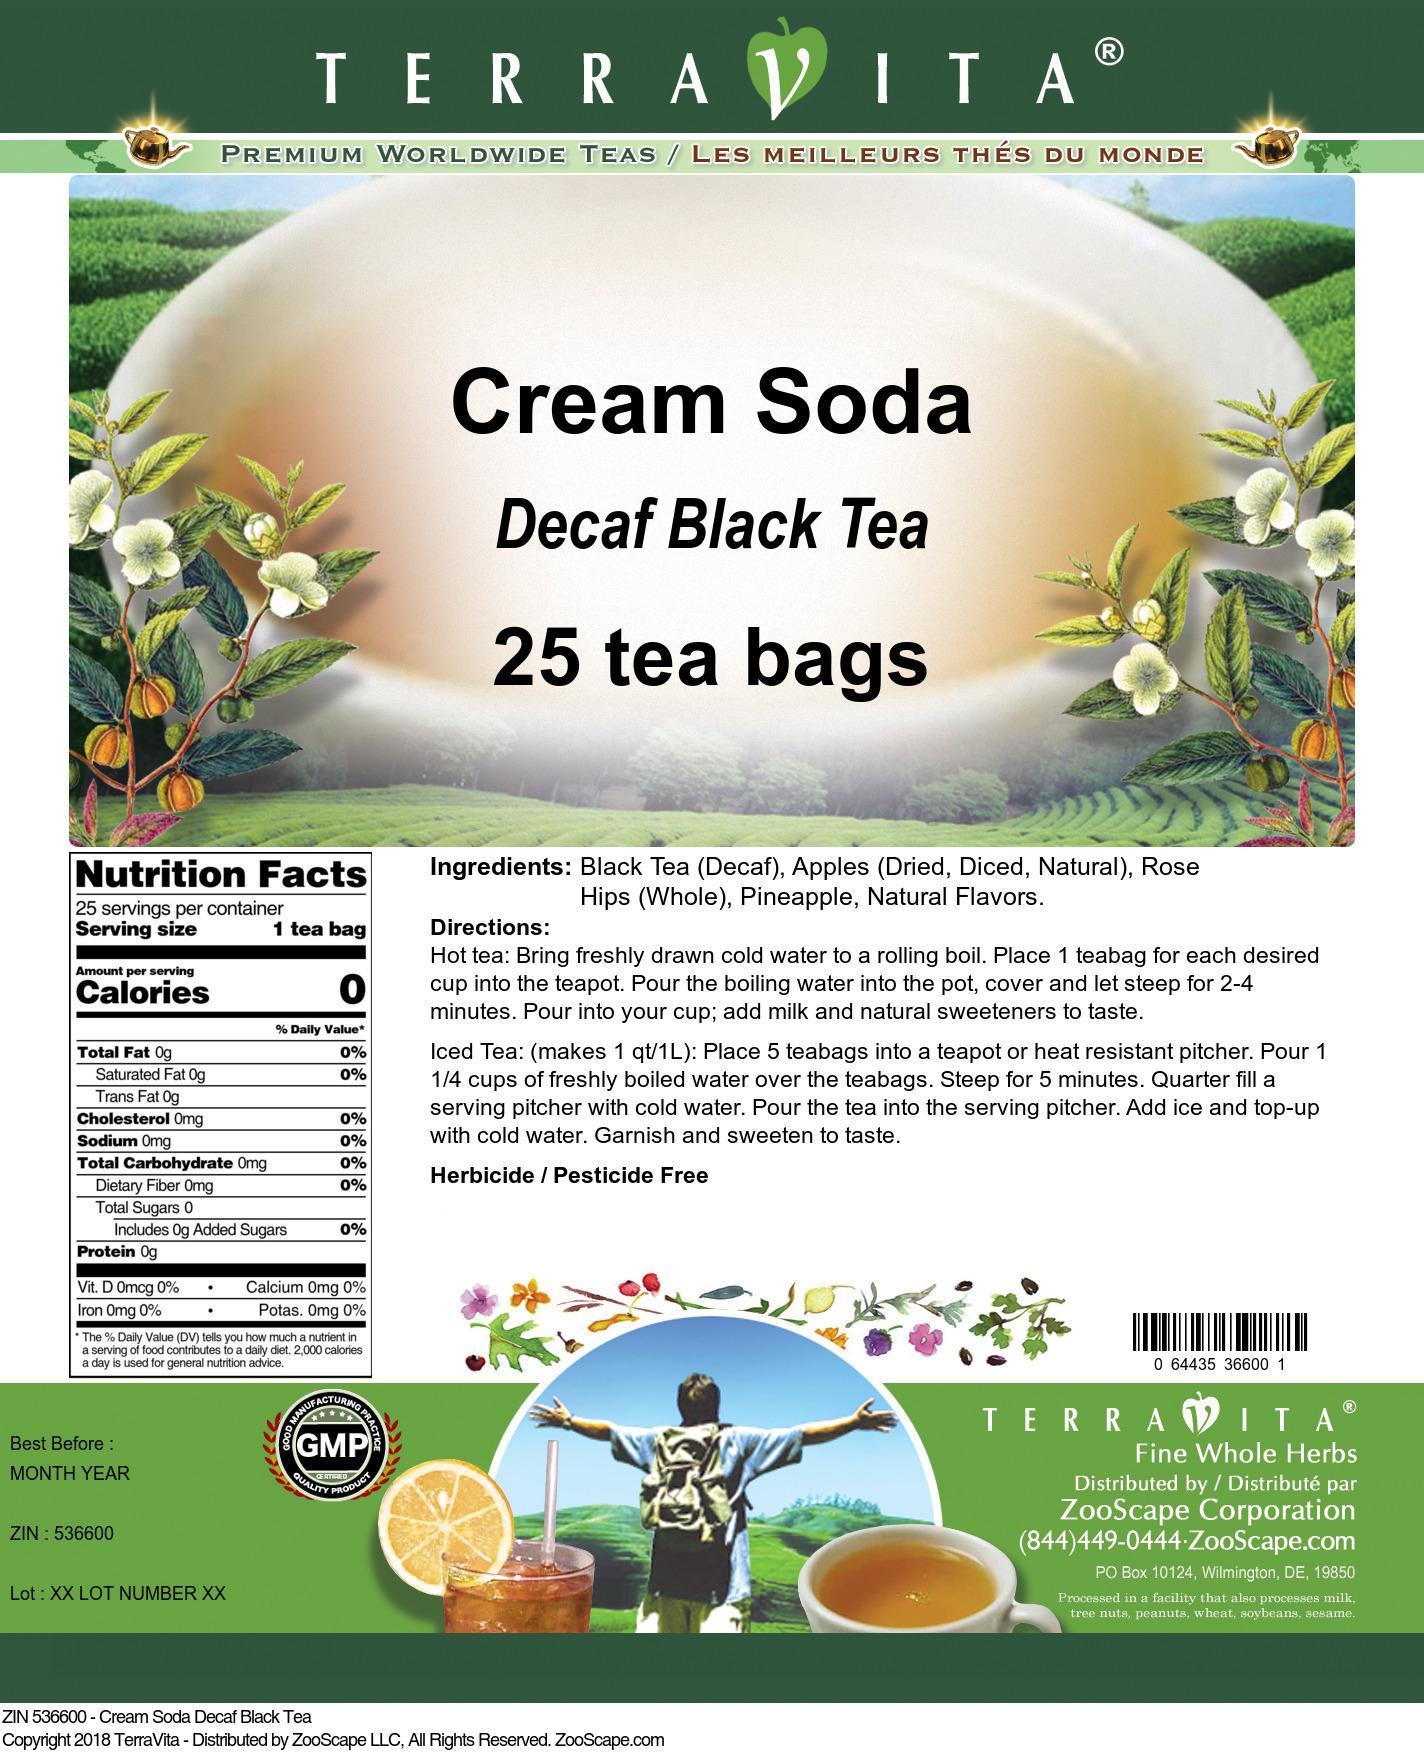 Cream Soda Decaf Black Tea